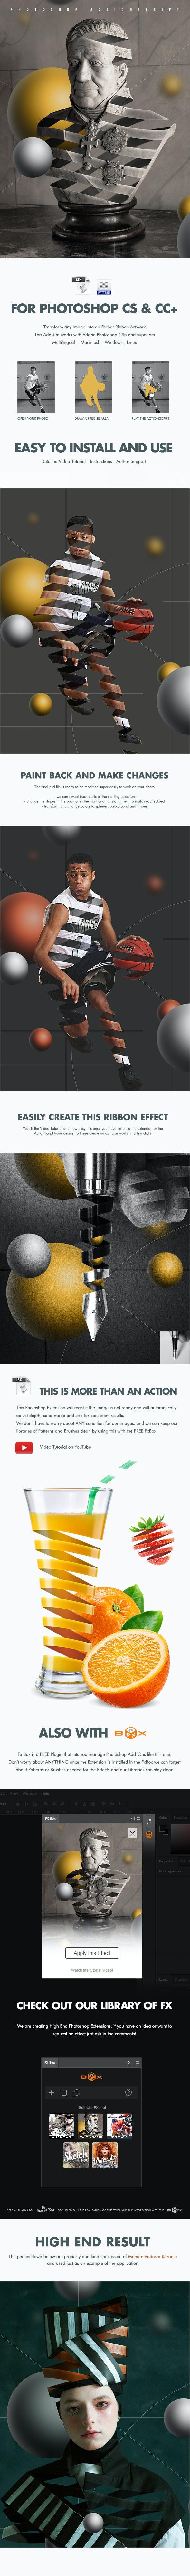 Escher Ribbon FX - Photoshop Add-On - Add-ons